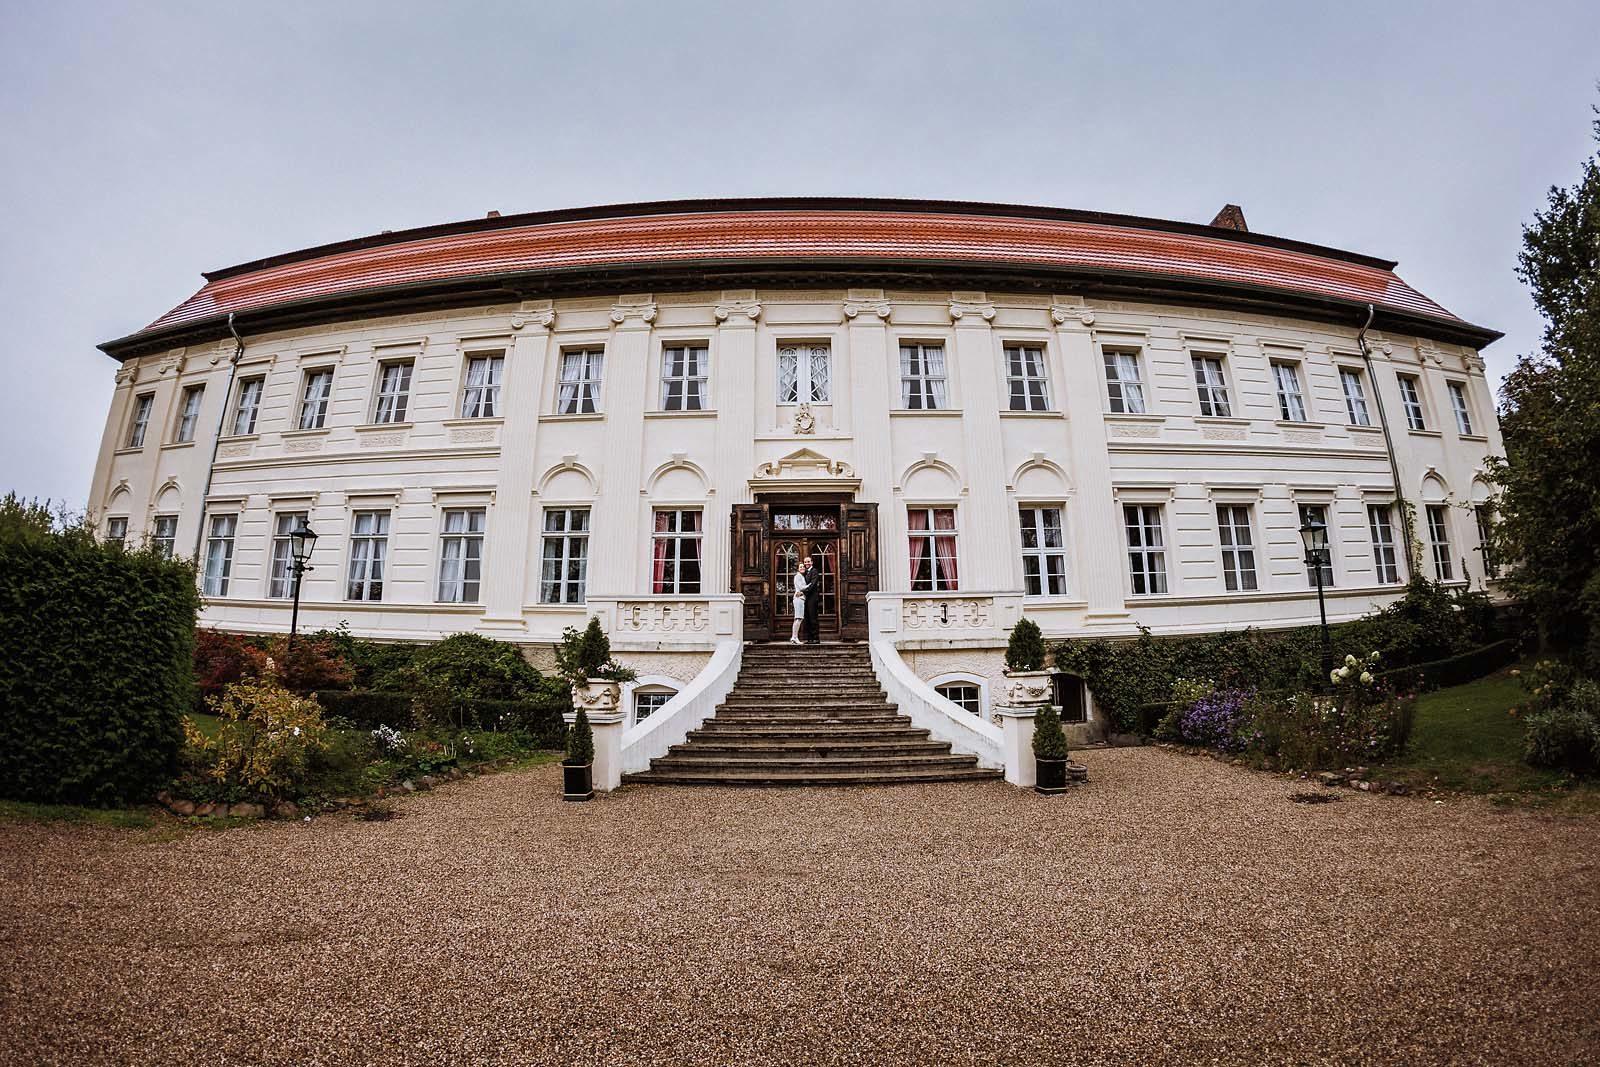 Hochzeitsfotograf Sachsen-Anhalt Schloss Dretzel